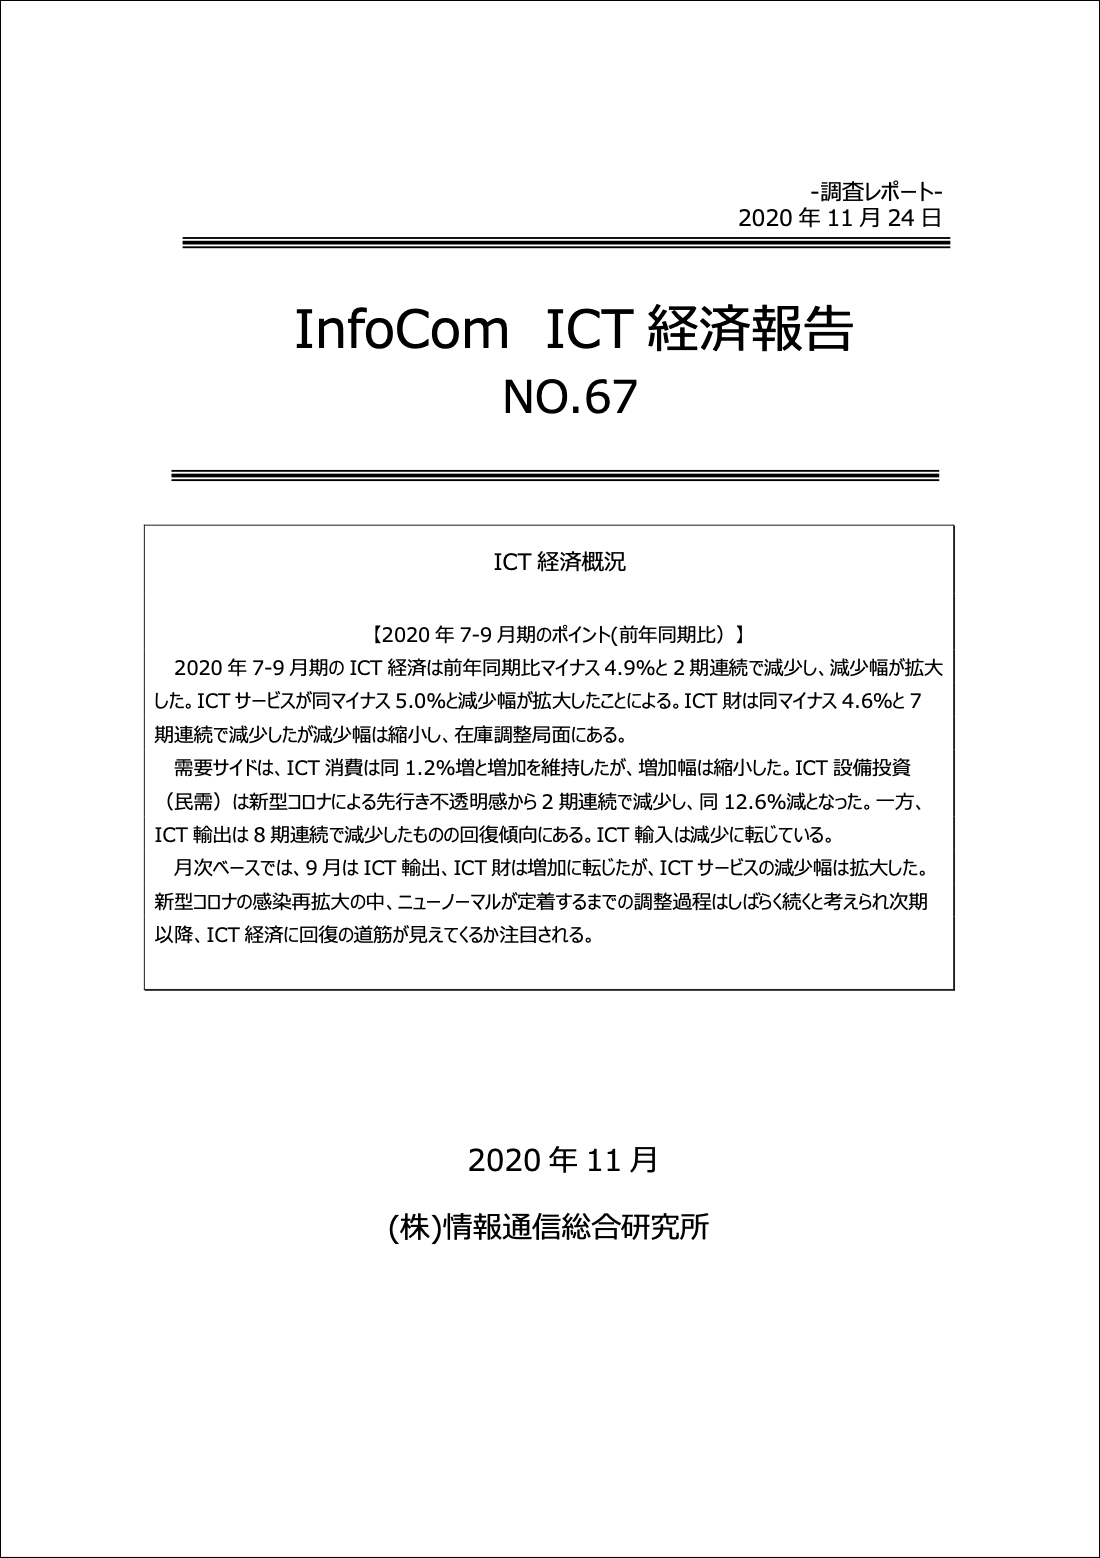 InfoCom ICT経済報告(No.67)